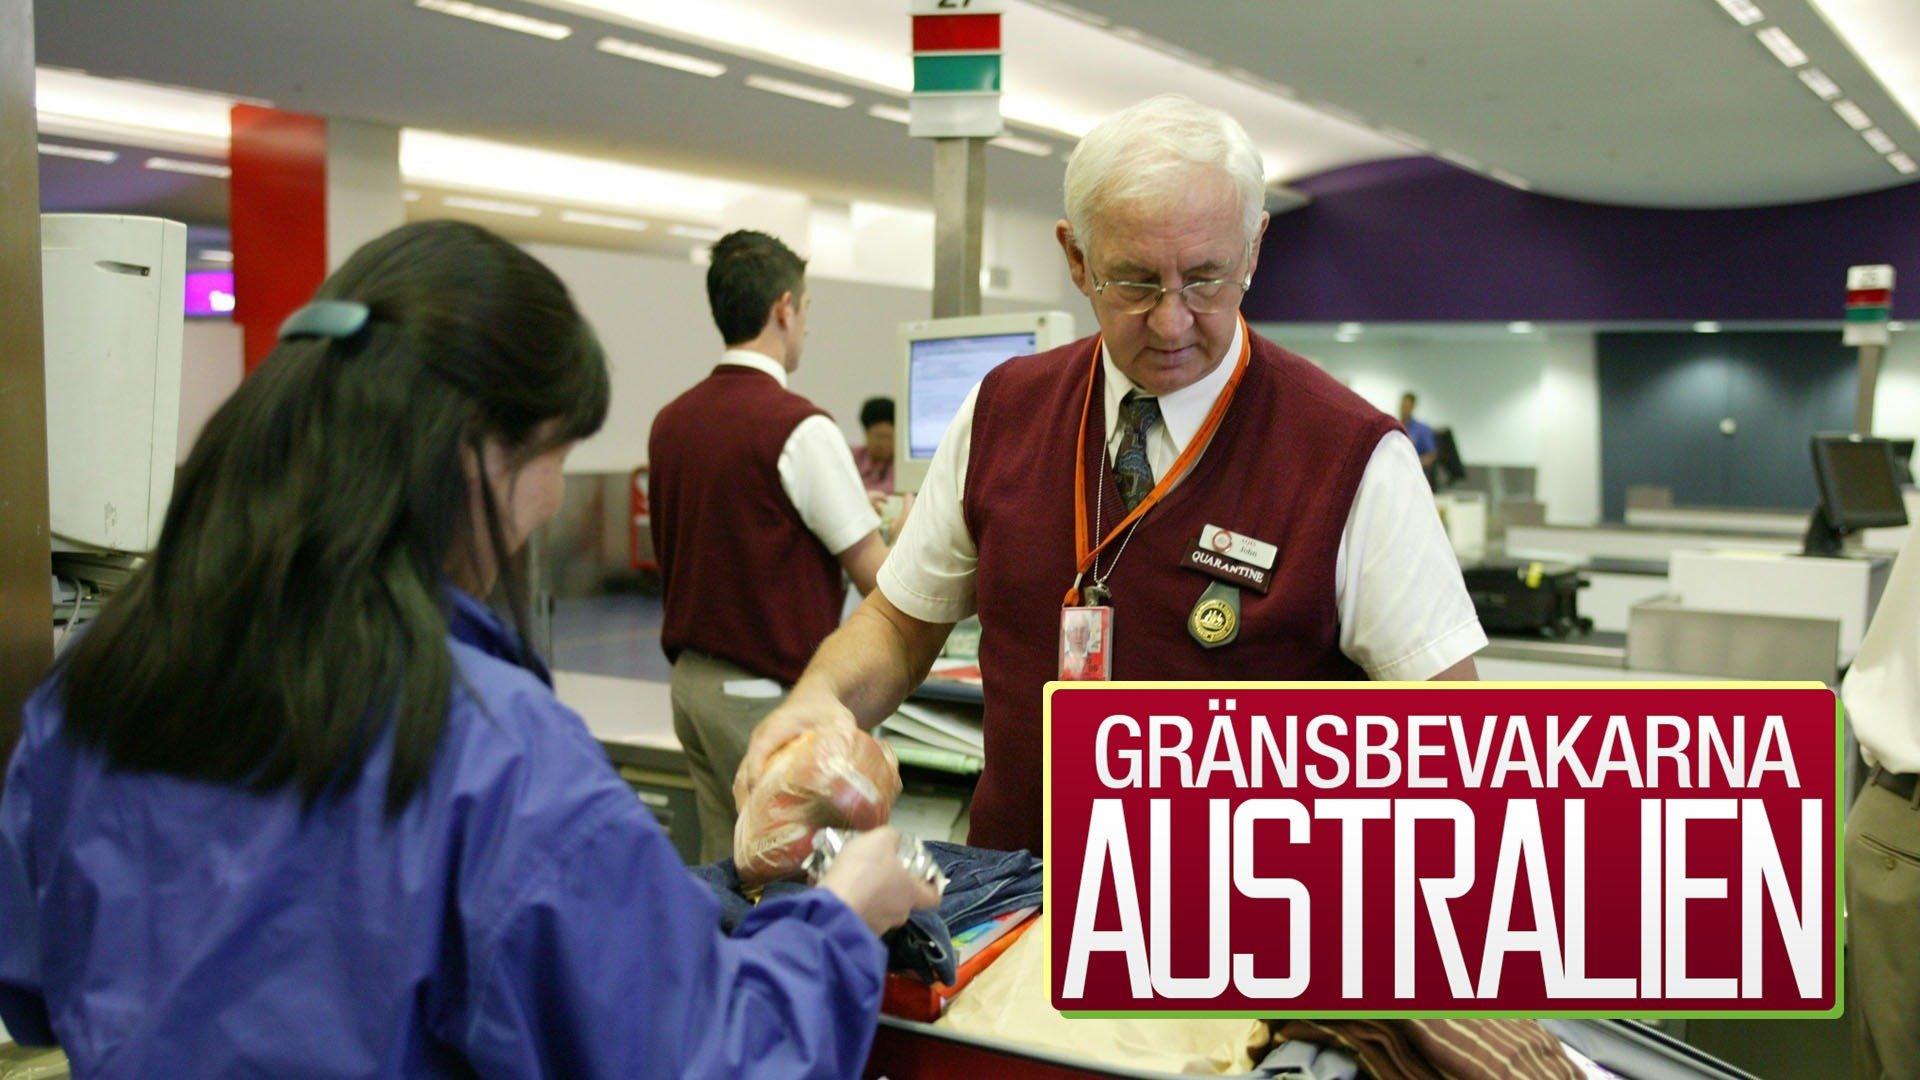 Gränsbevakarna Australien